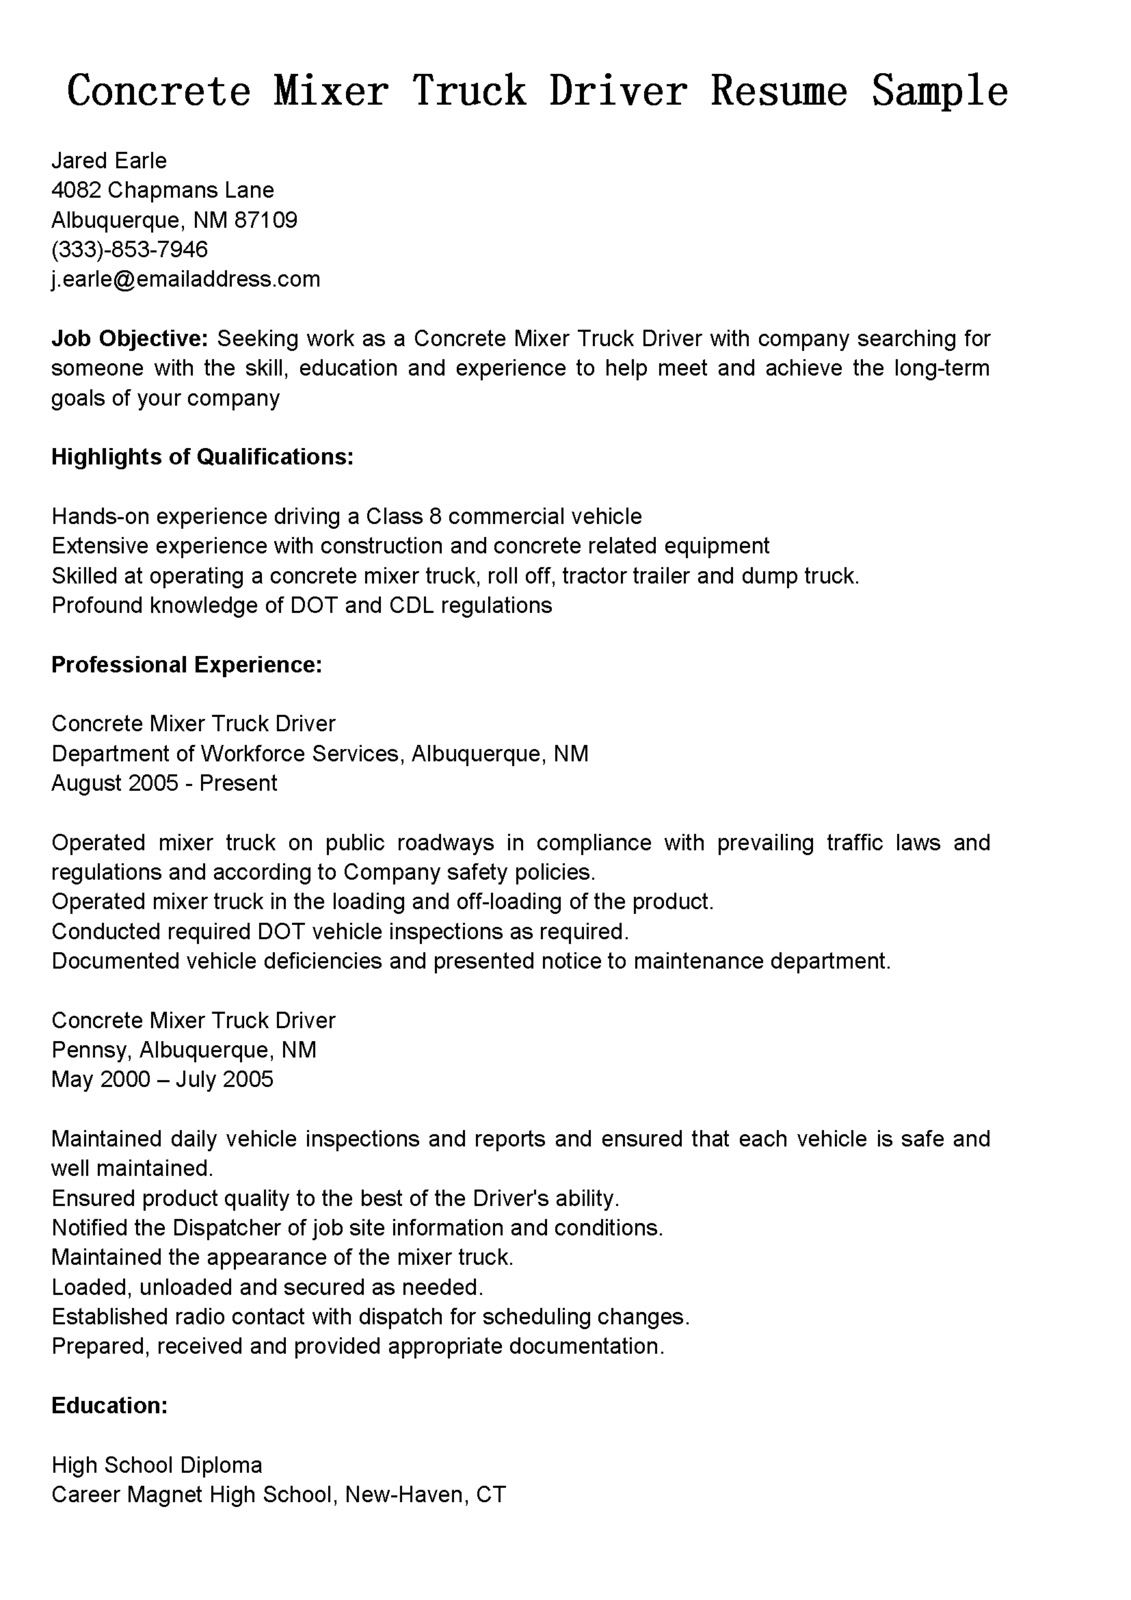 Resume For Cdl Truck Driver - Resume Sample